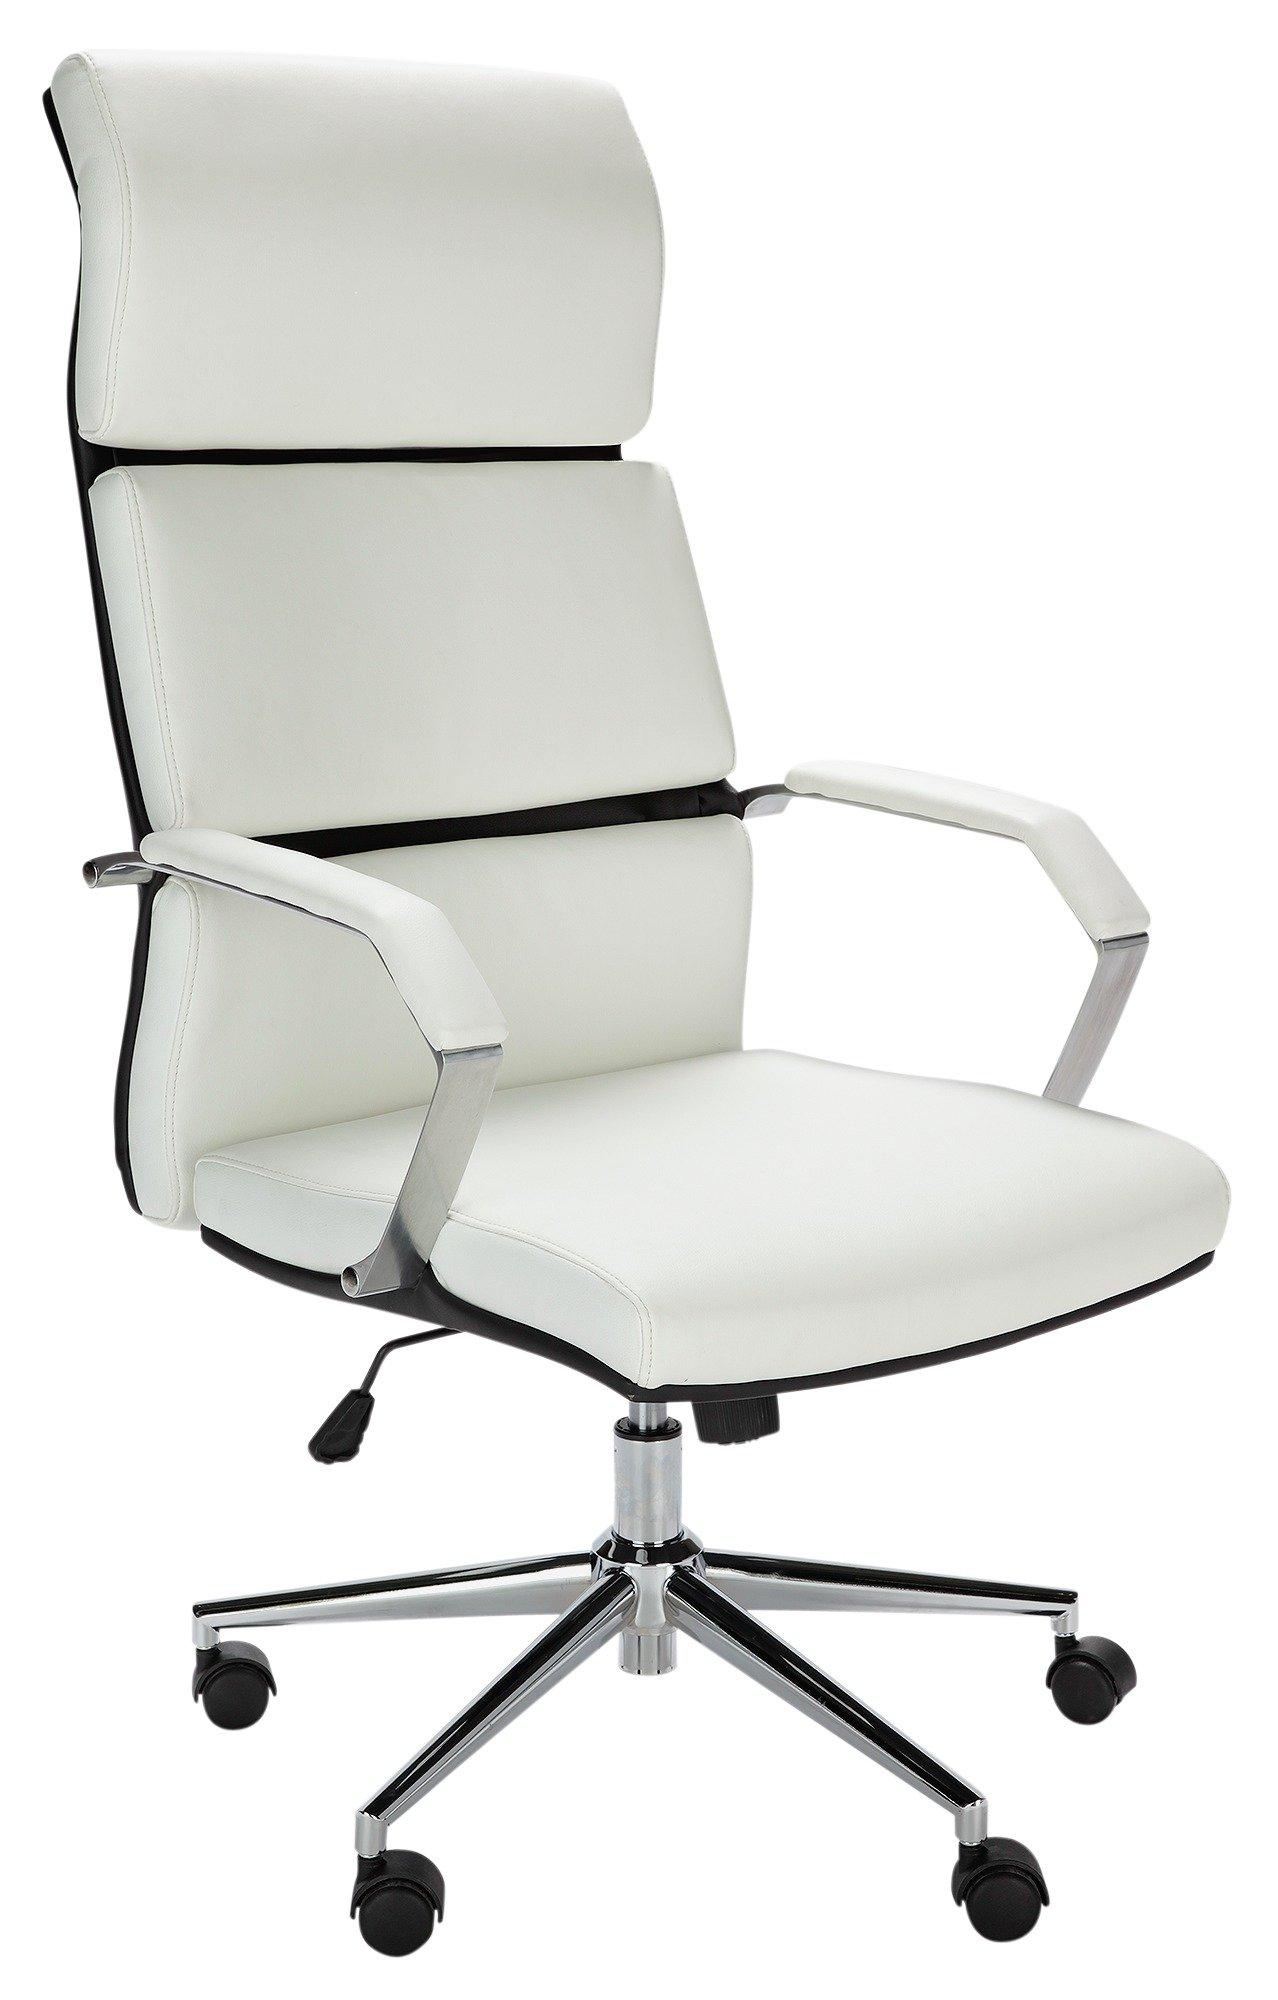 jasper chair company stressless review uk hygena adjustable office